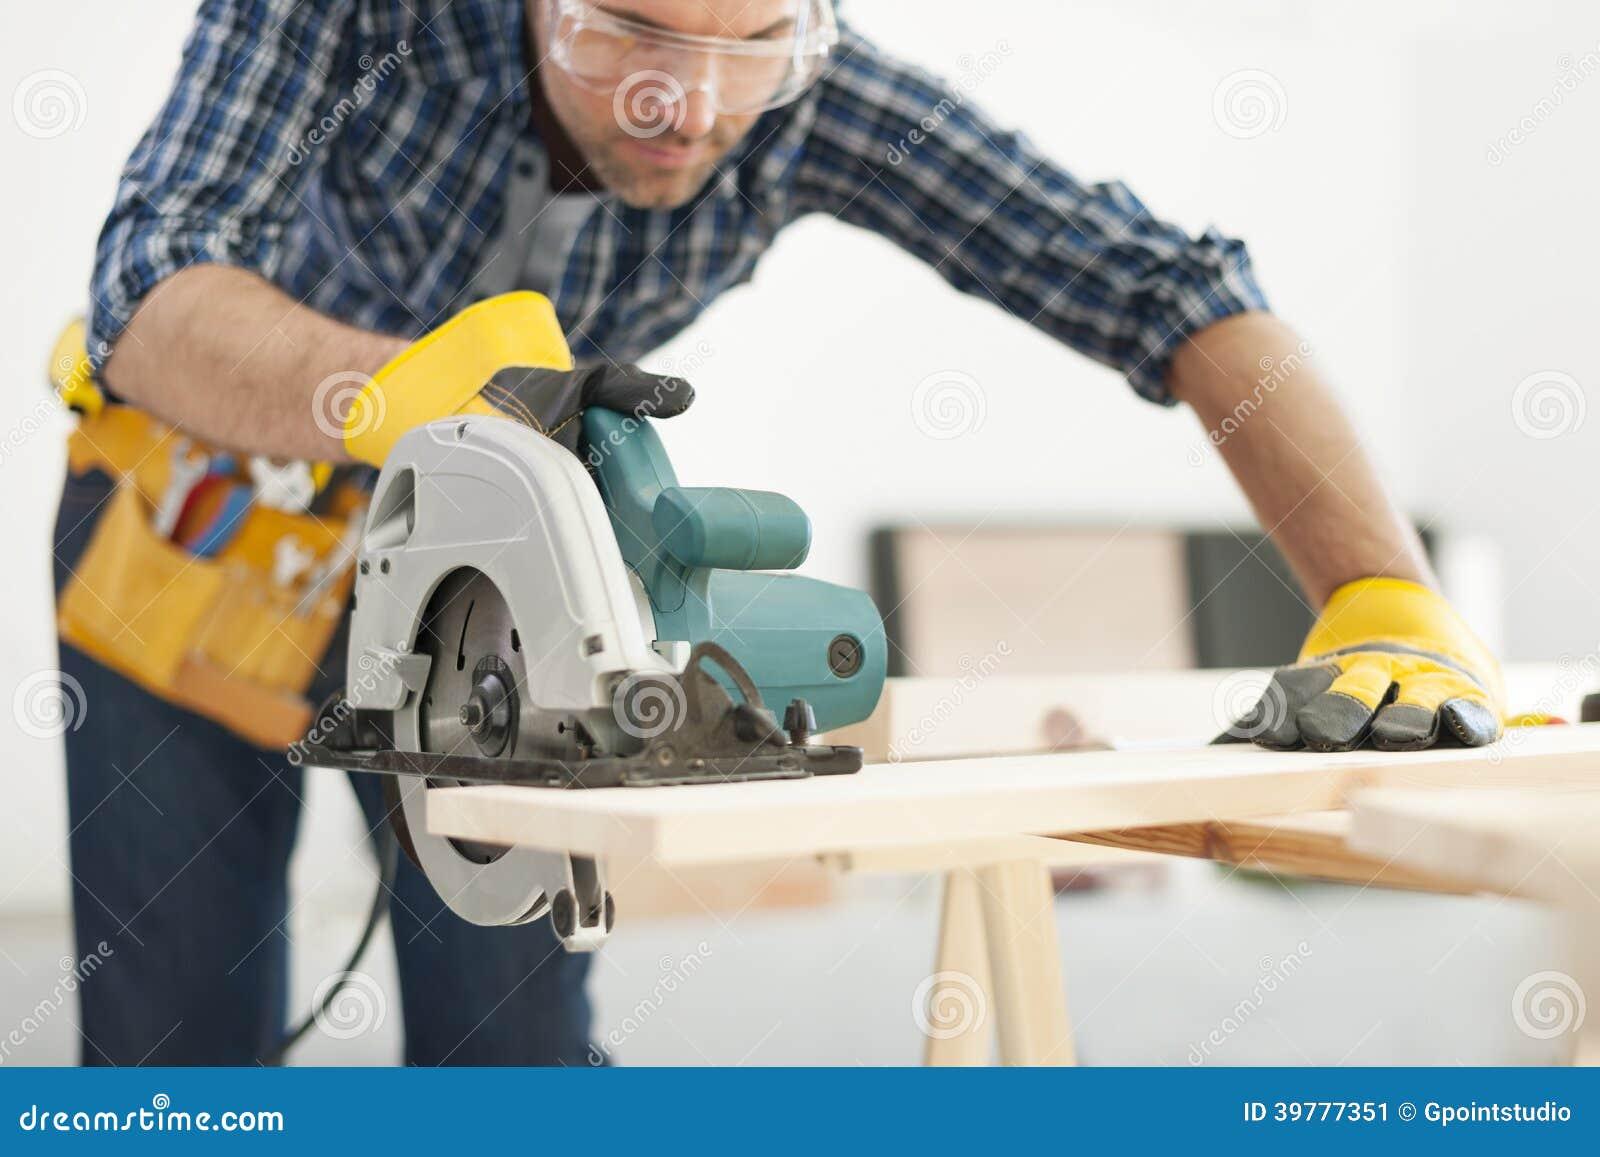 Carpenter At Work Stock Photo - Image: 39777351